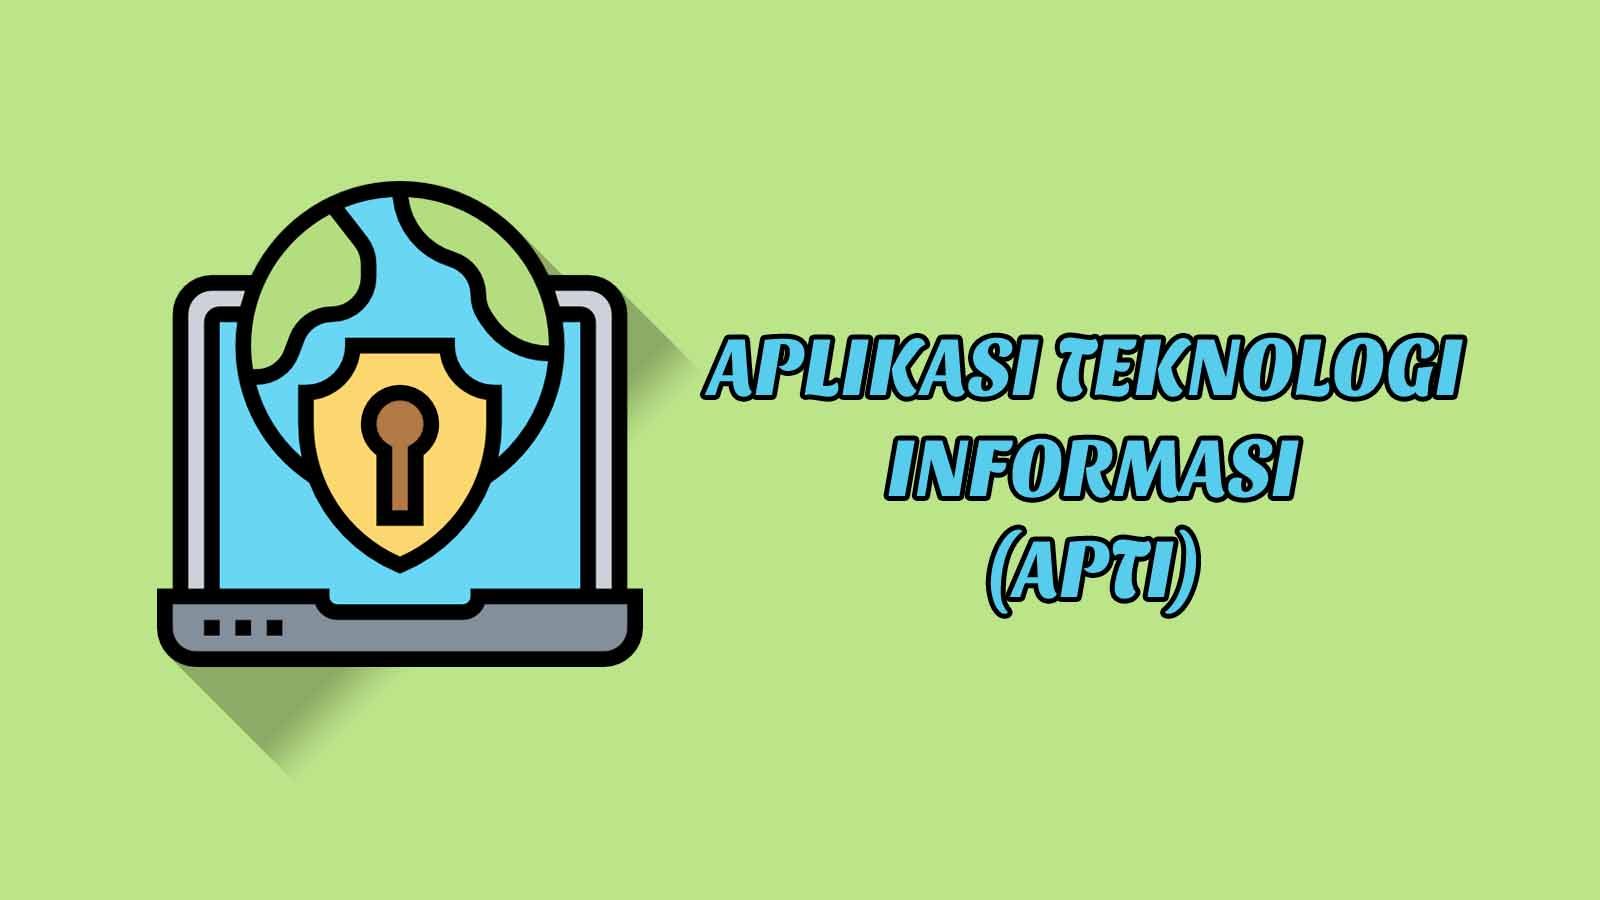 Daftar Isi - Aplikasi Teknologi Informasi (APTI)